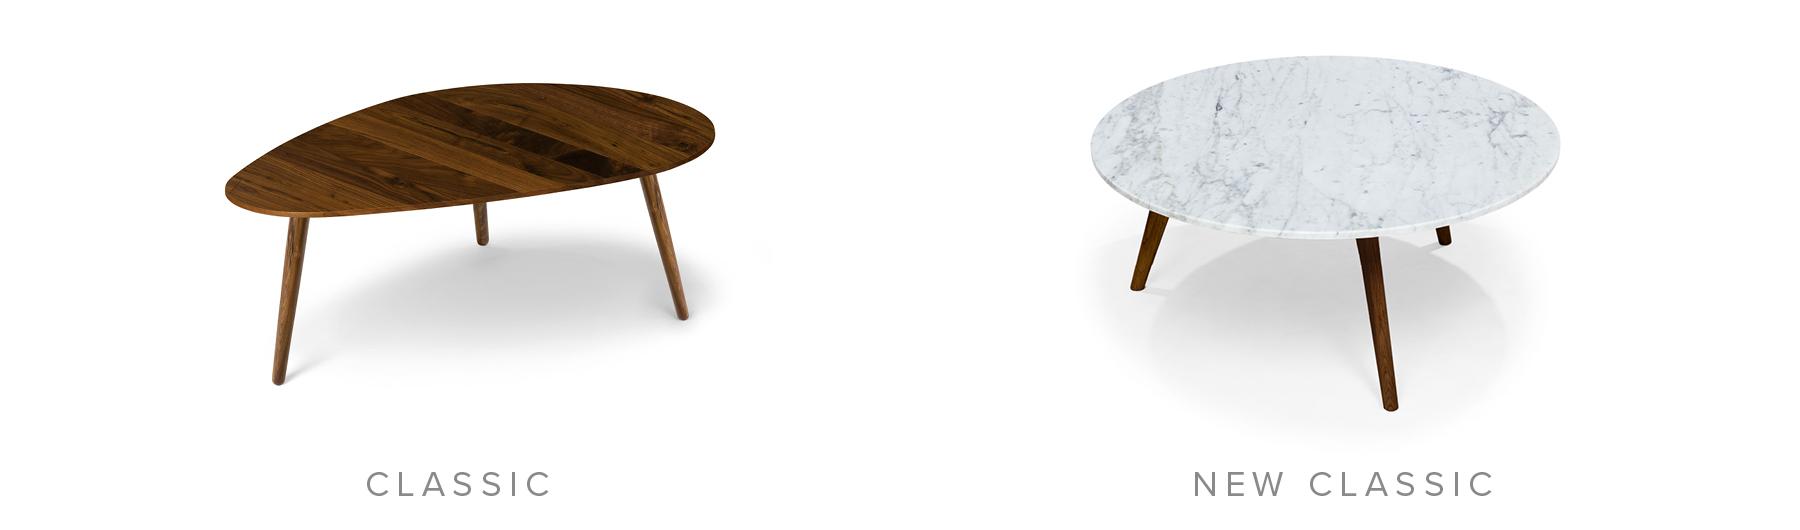 Classic: Amoeba Wild Walnut Coffee Table. New Classic: Mara Walnut Coffee Table